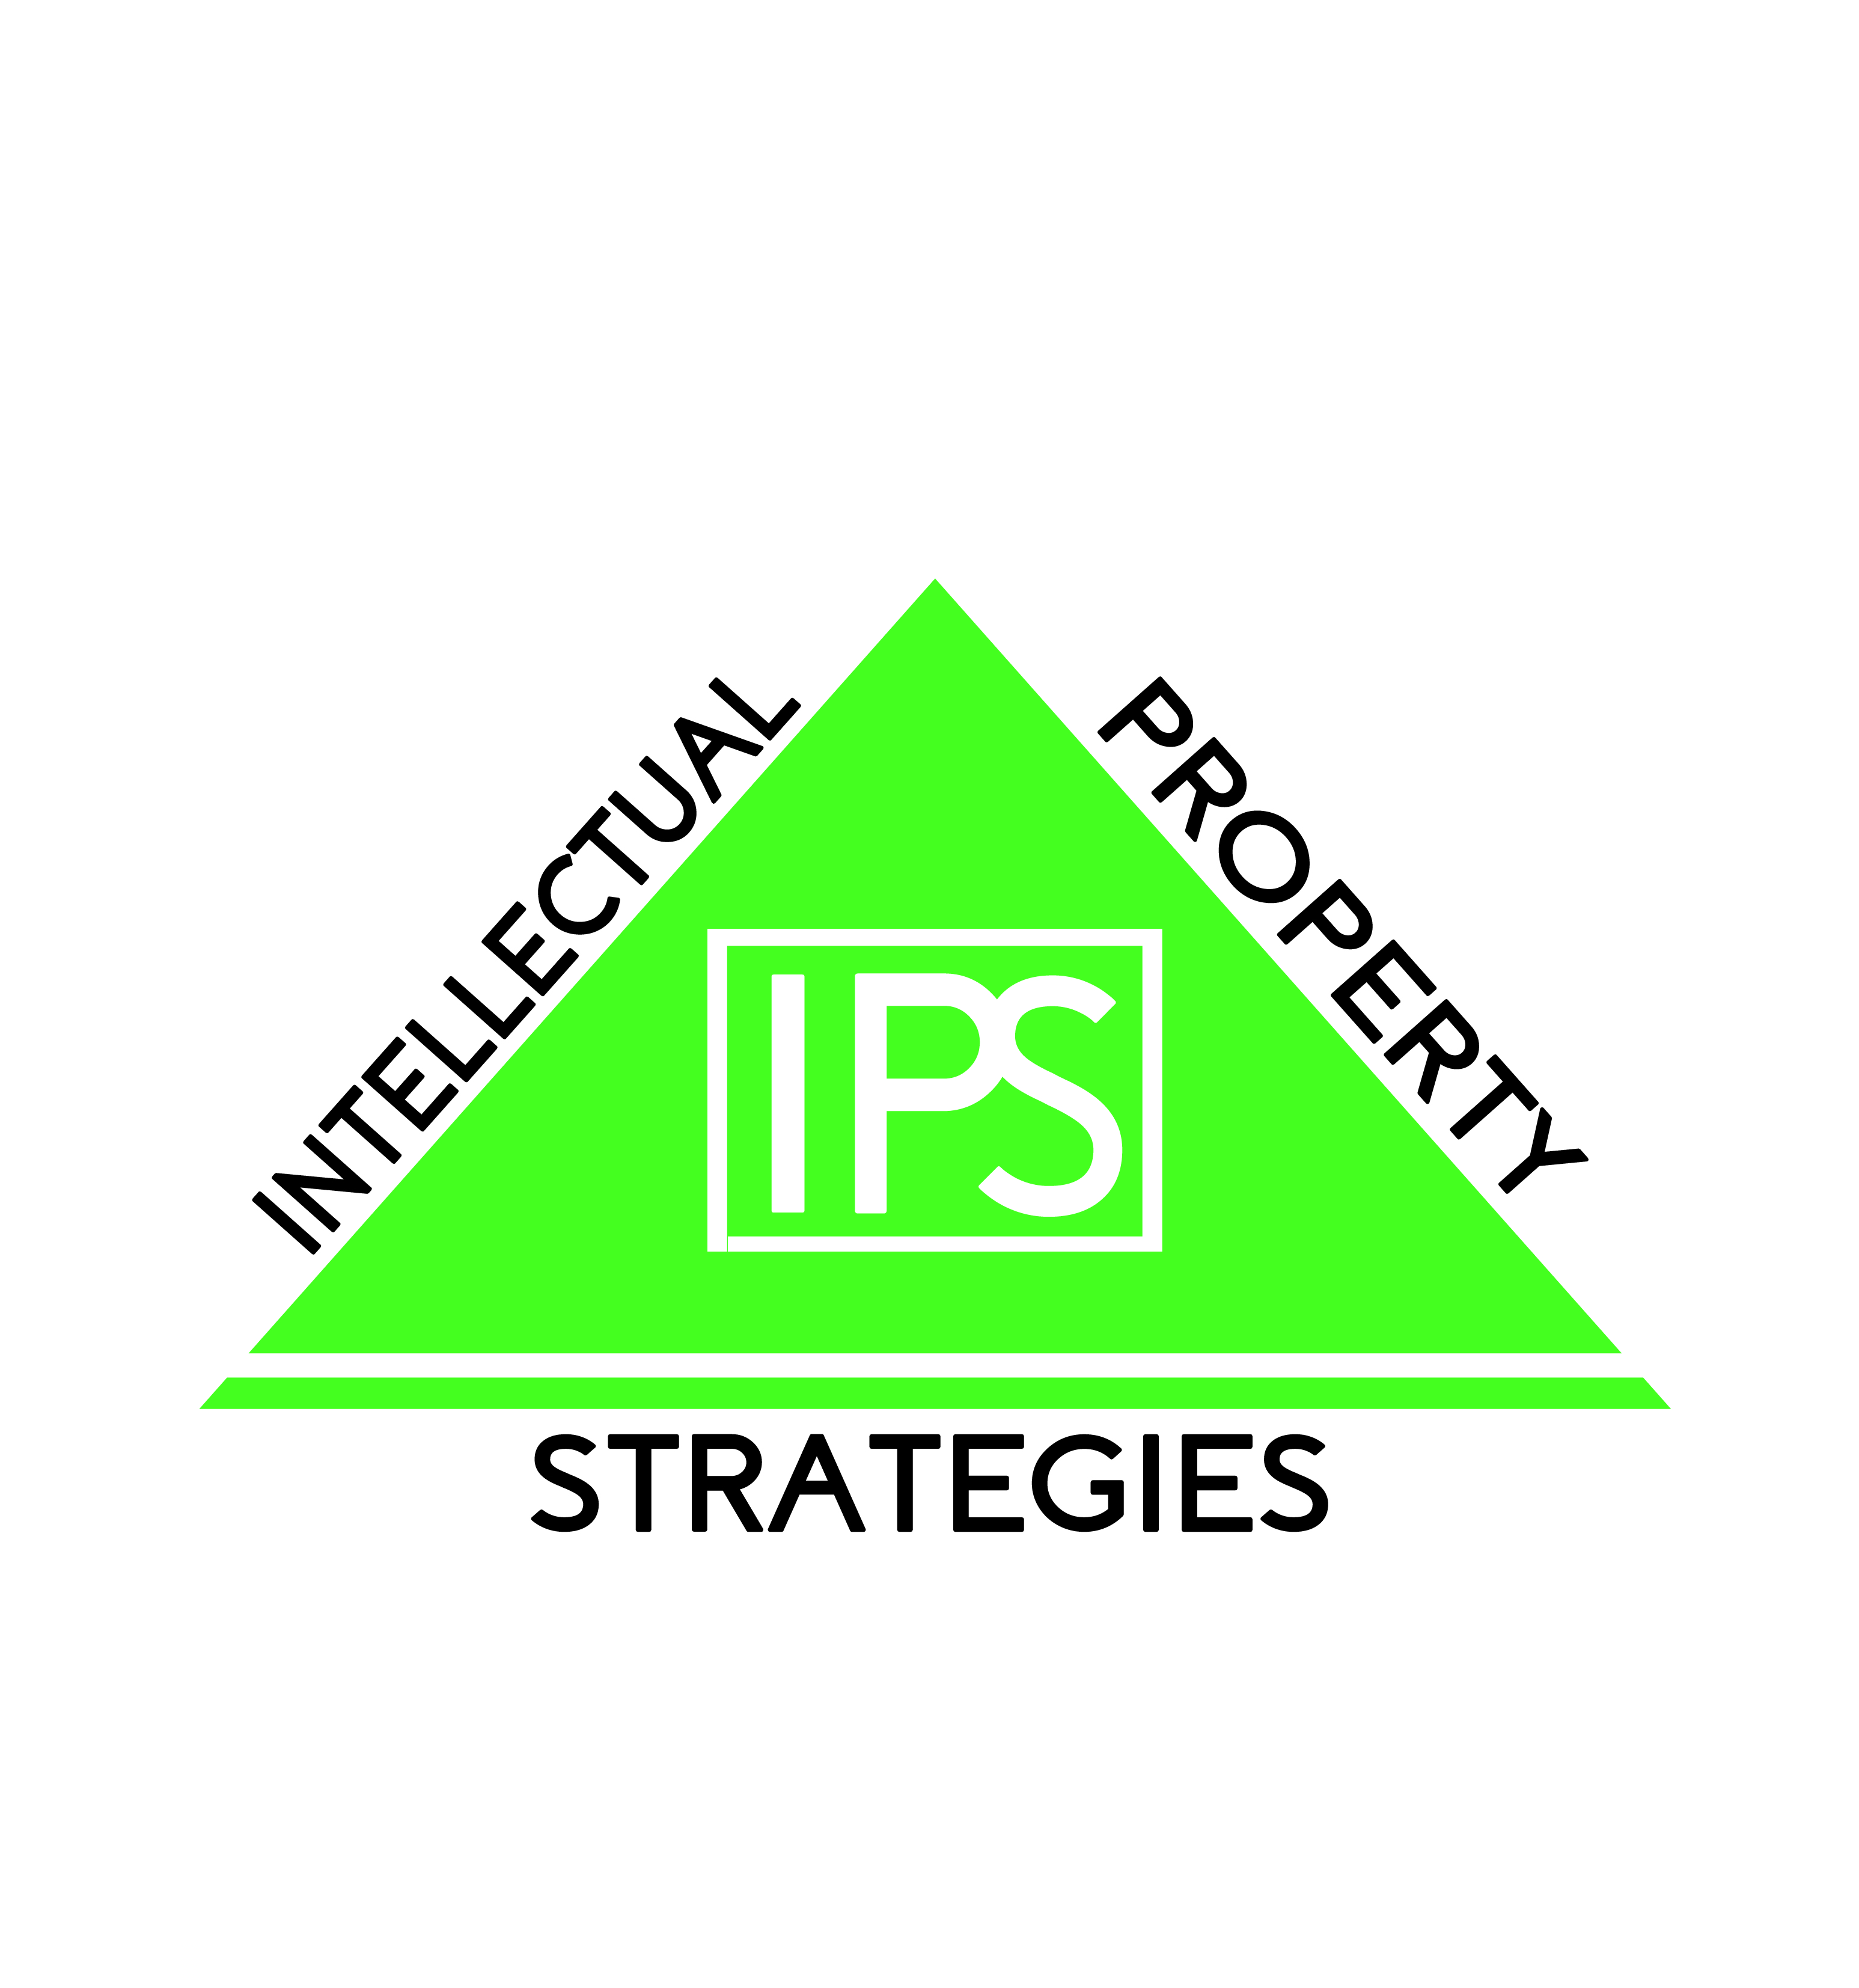 Intellectual Property Strategies